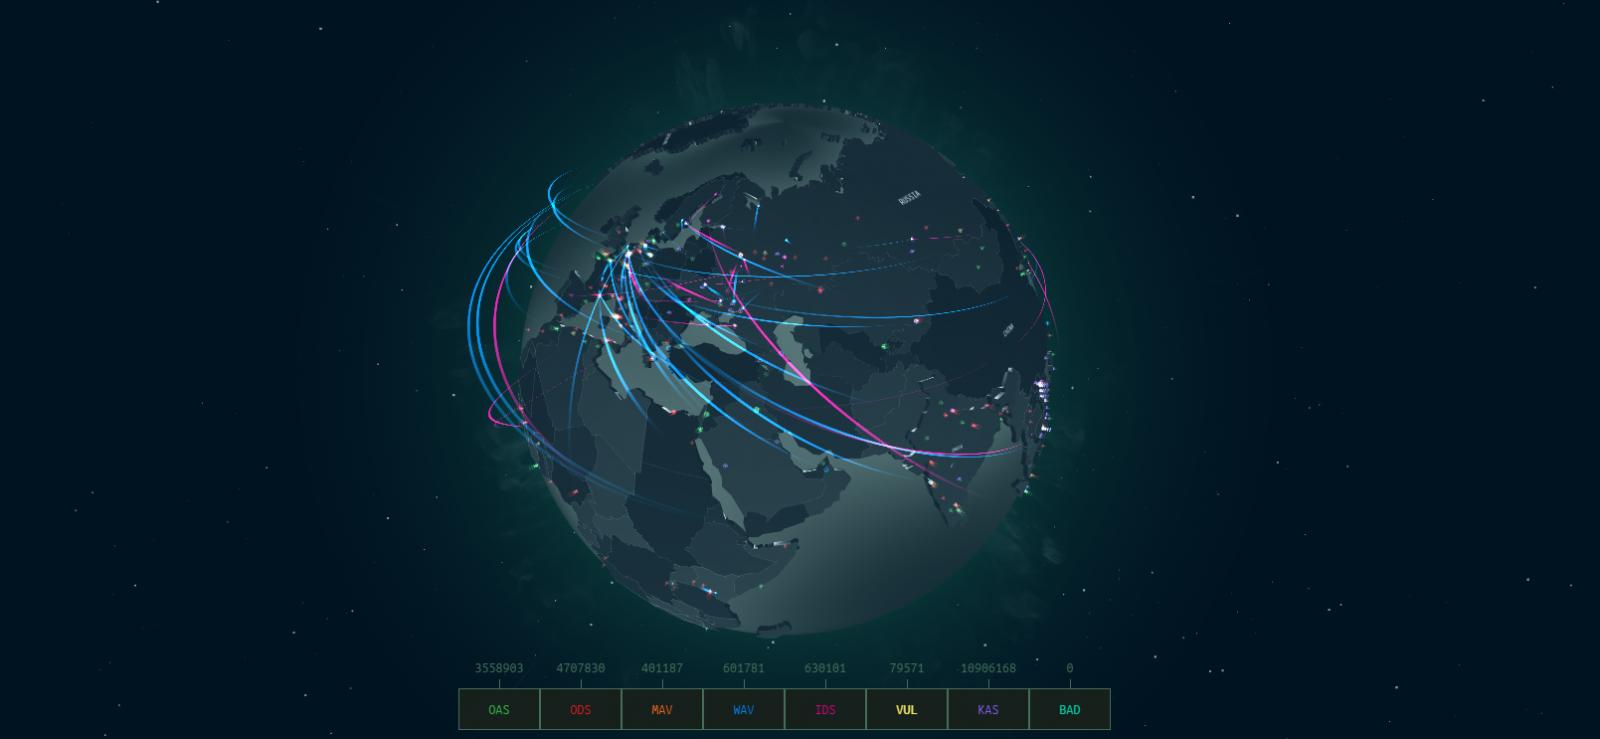 Kaspersky real-time cyberthreat map